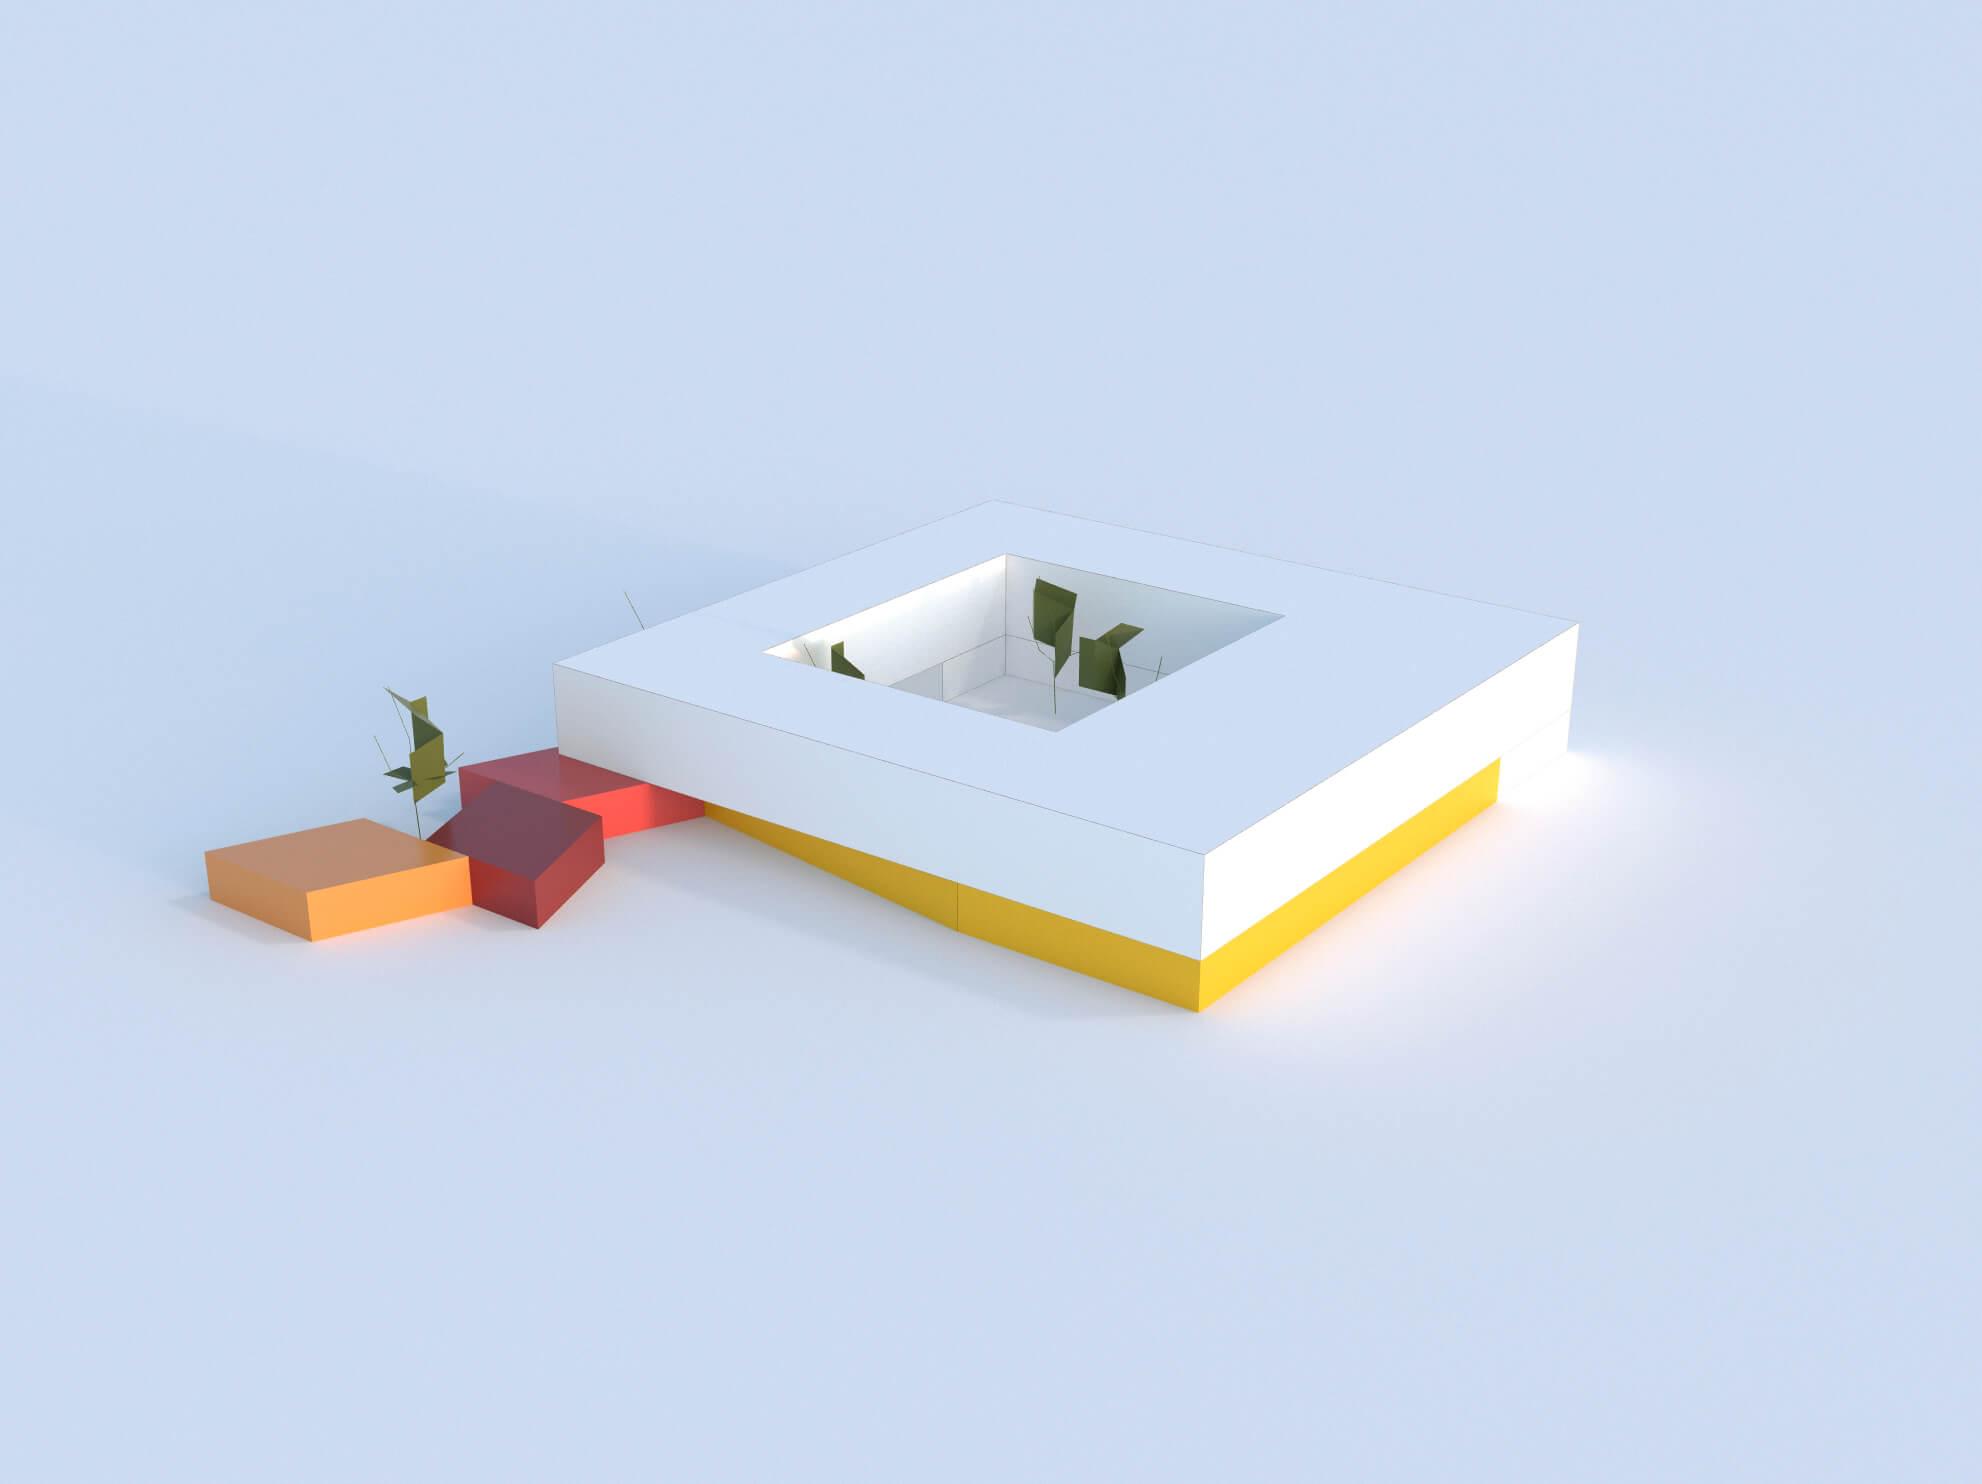 planell-hirsch_concurso_arquitectura_alemania axo